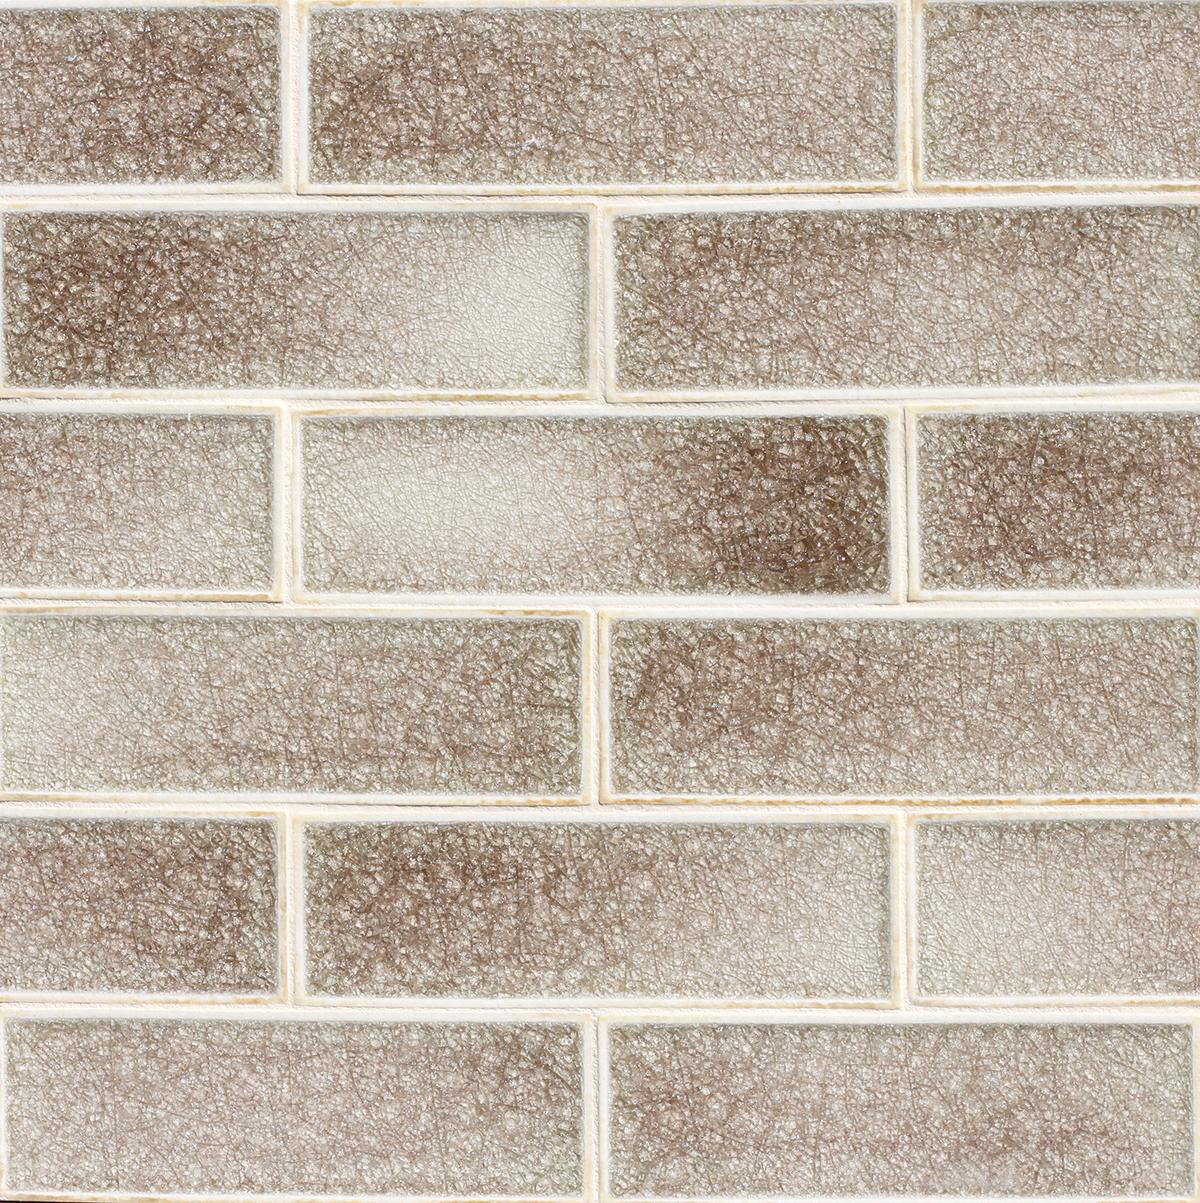 Fine 12X24 Floor Tile Big 2 X 6 Subway Tile Backsplash Rectangular 24X48 Ceiling Tiles 2X2 Ceiling Tiles Young 2X4 Black Ceiling Tiles Coloured2X4 Ceiling Tiles Cheap 2×6 Field Tile \u2013 Encore Ceramics